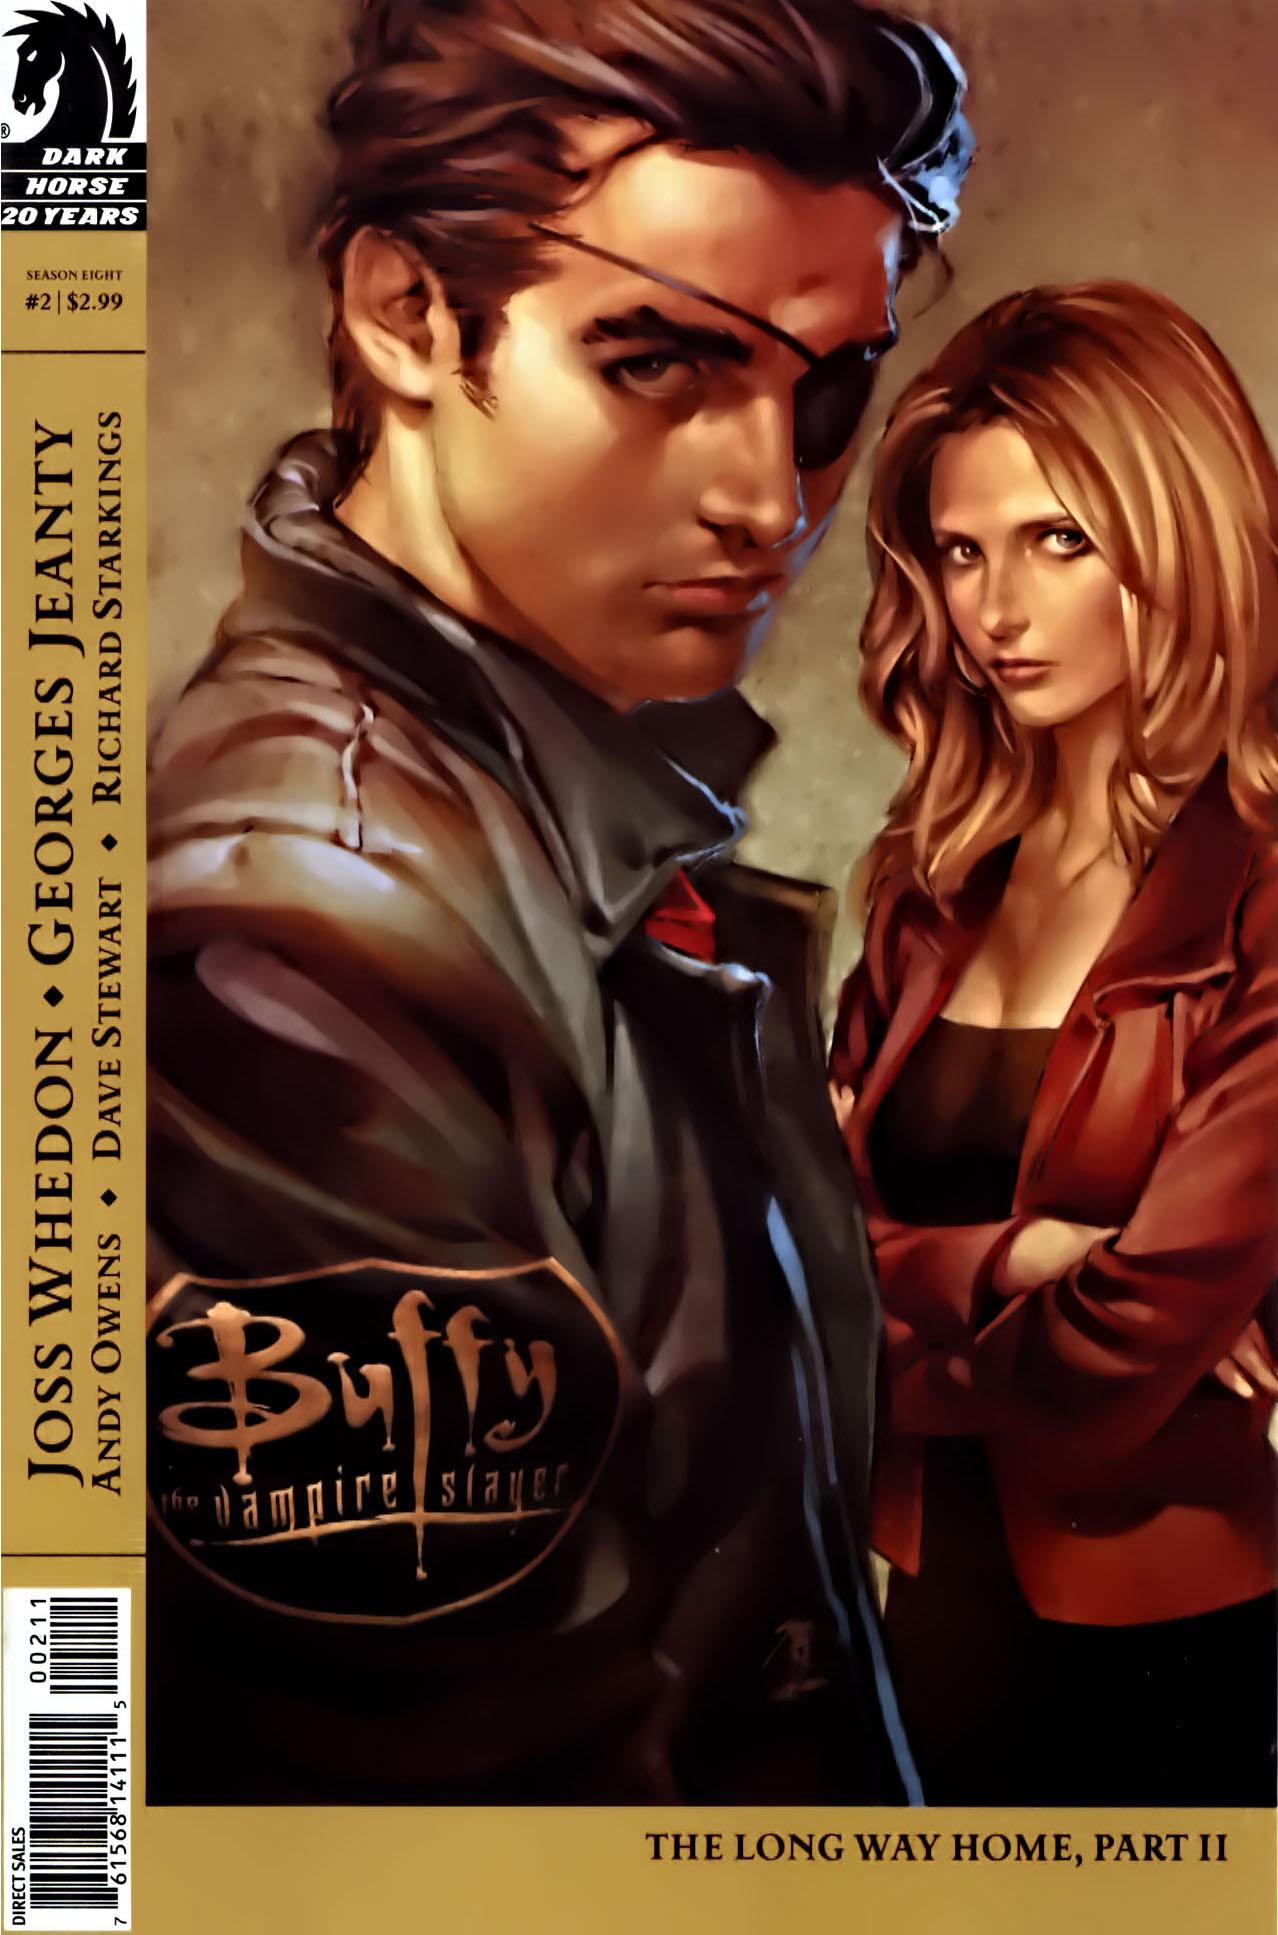 Buffy the Vampire Slayer Season Eight 2 Page 1